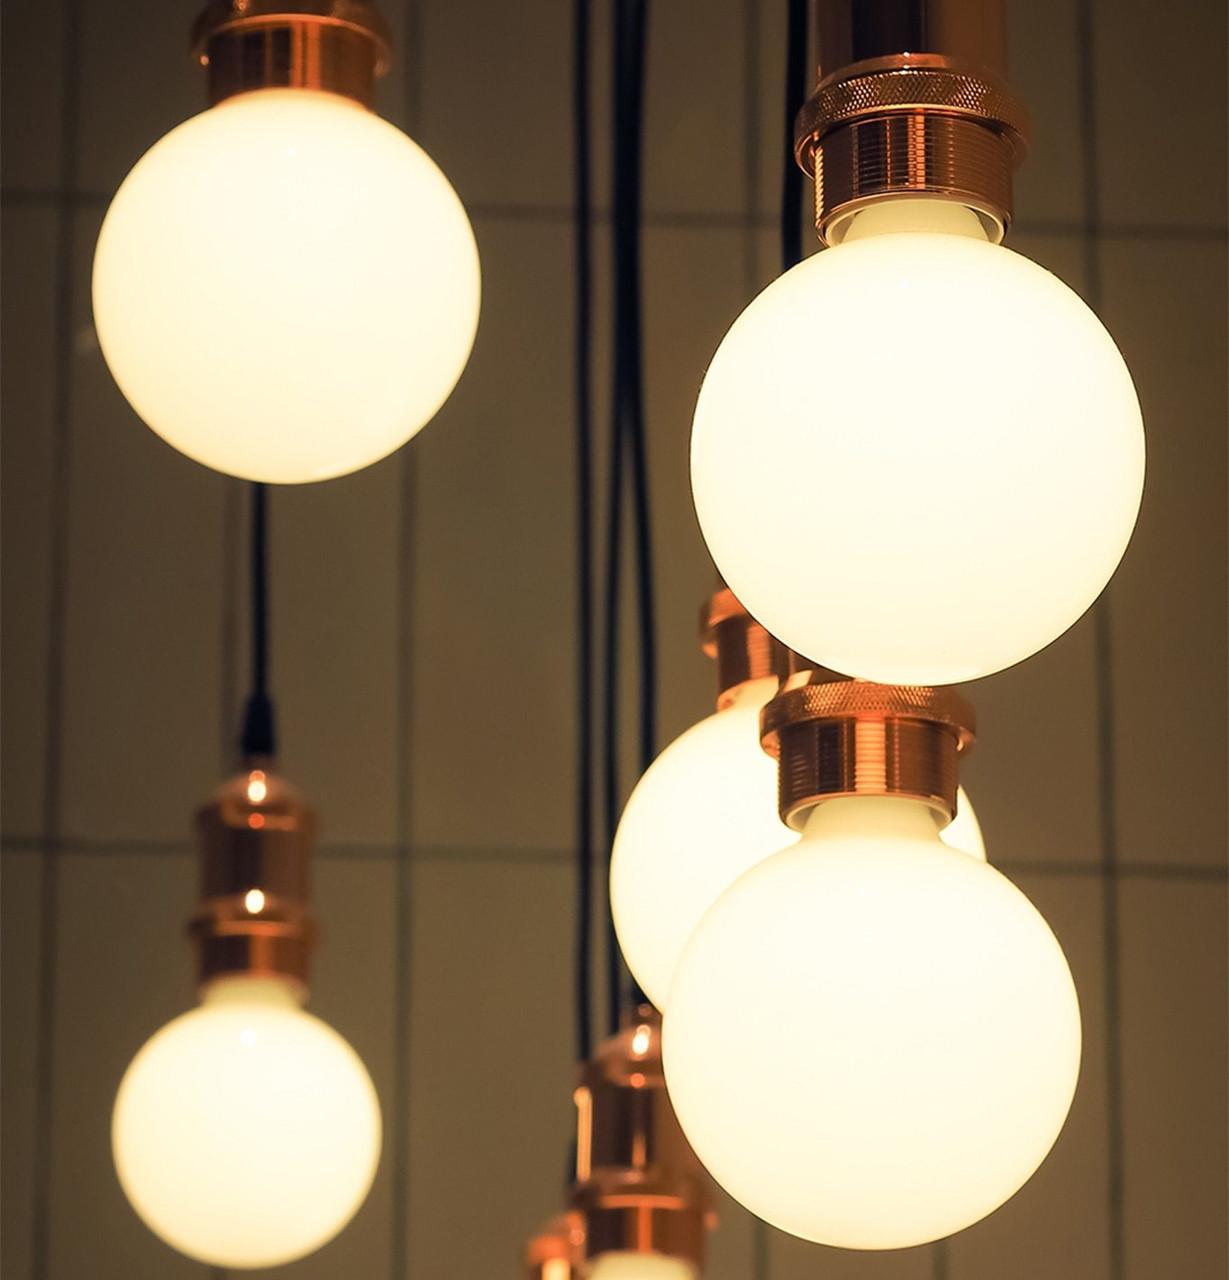 LED Dimmable G80 Antique Bronze Light Bulbs